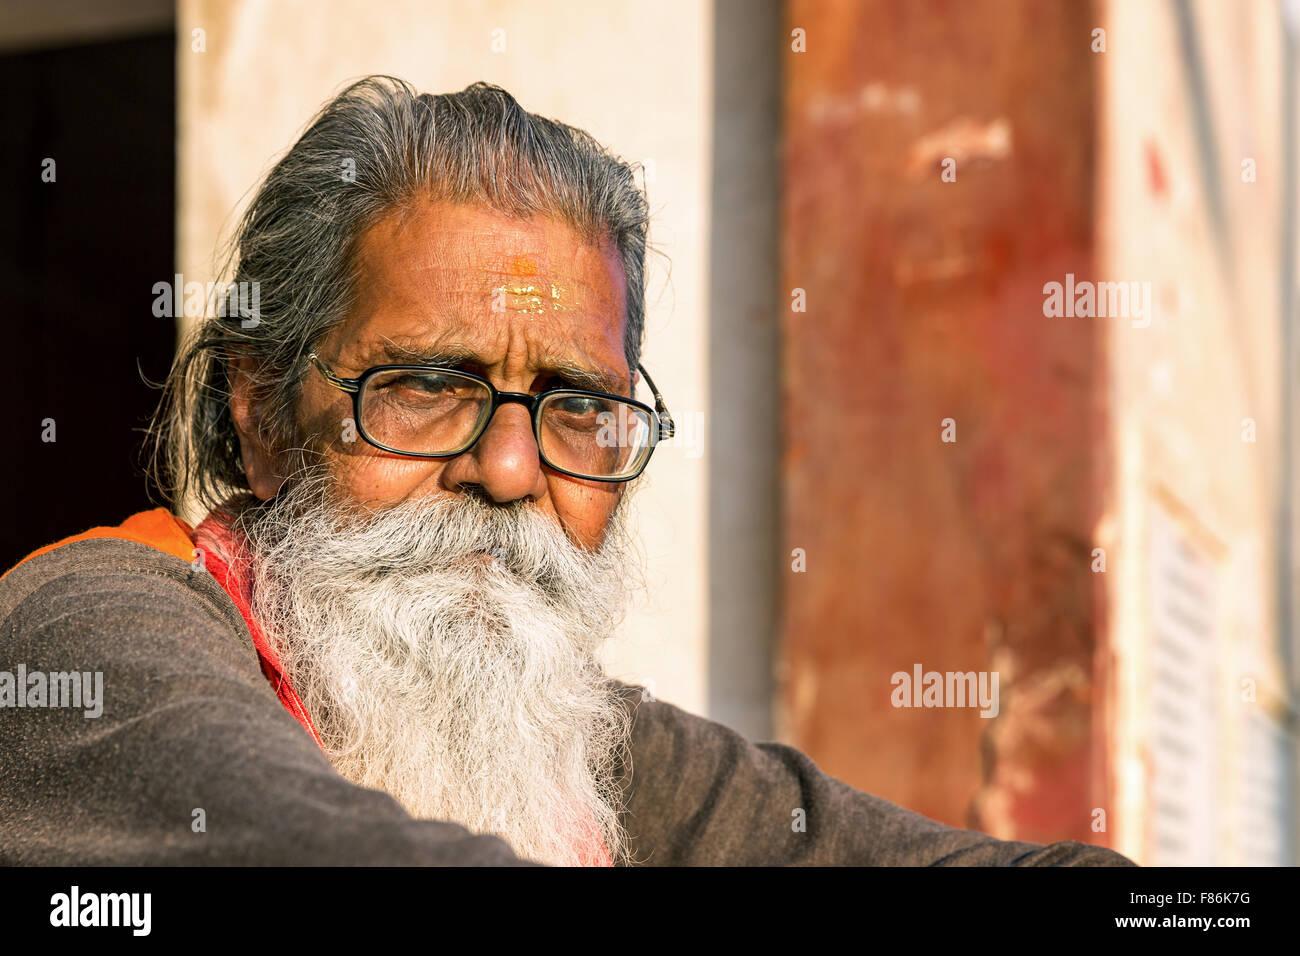 A Sadhu, holy man, Galtaji, Khania-Balaji, Jaipur, Rajasthan, India - Stock Image